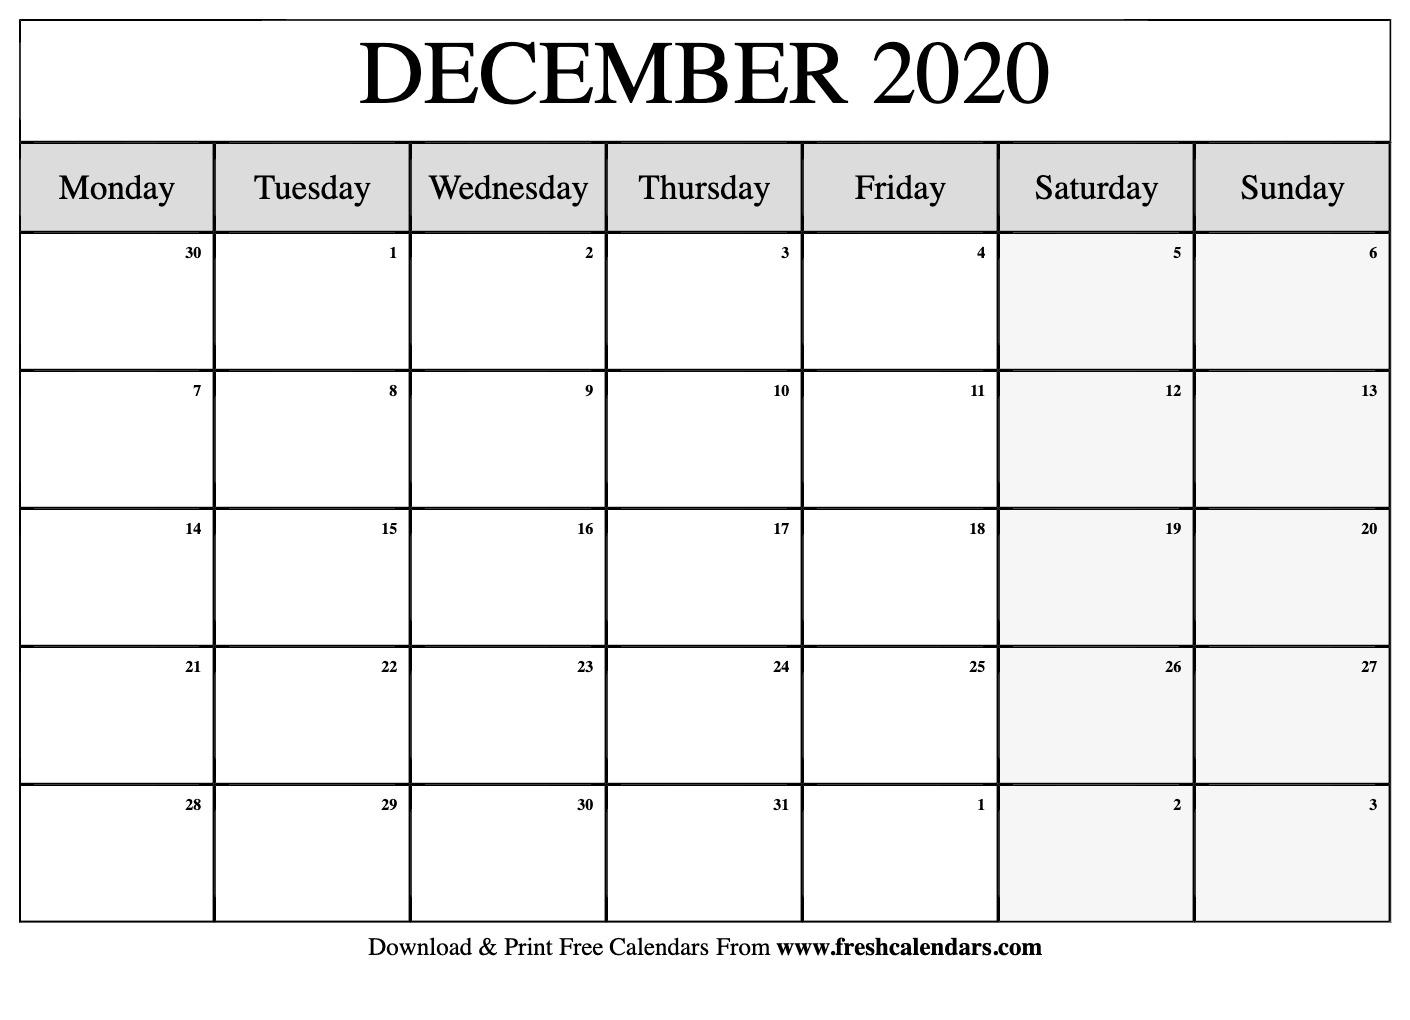 Free Printable December 2020 Calendar Free Printable Monthly Calendars Monday Start